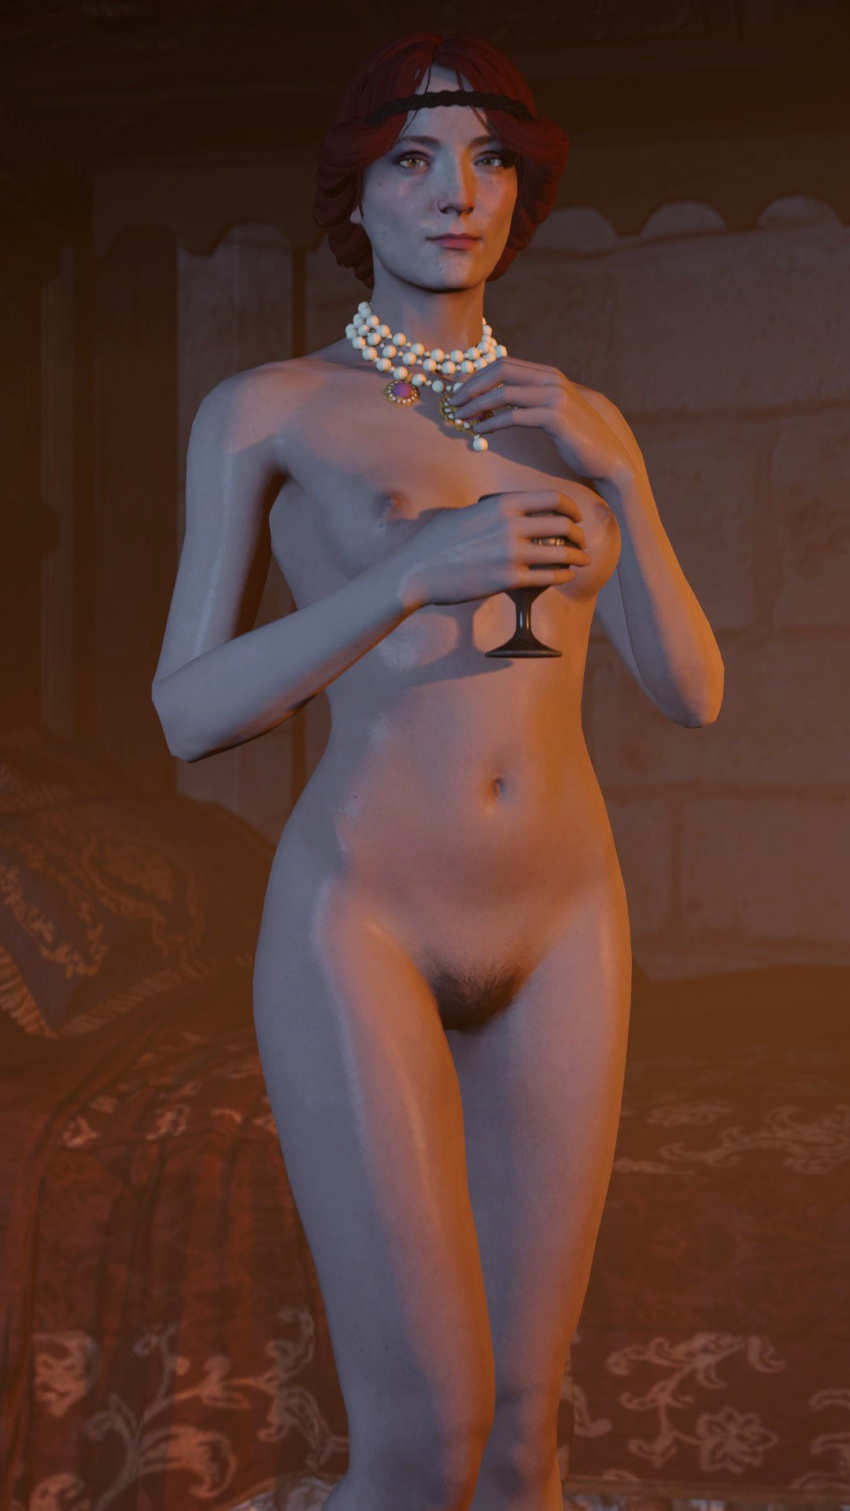 the mightiest nude disciple kenichi Yellow diamond helmet or hair